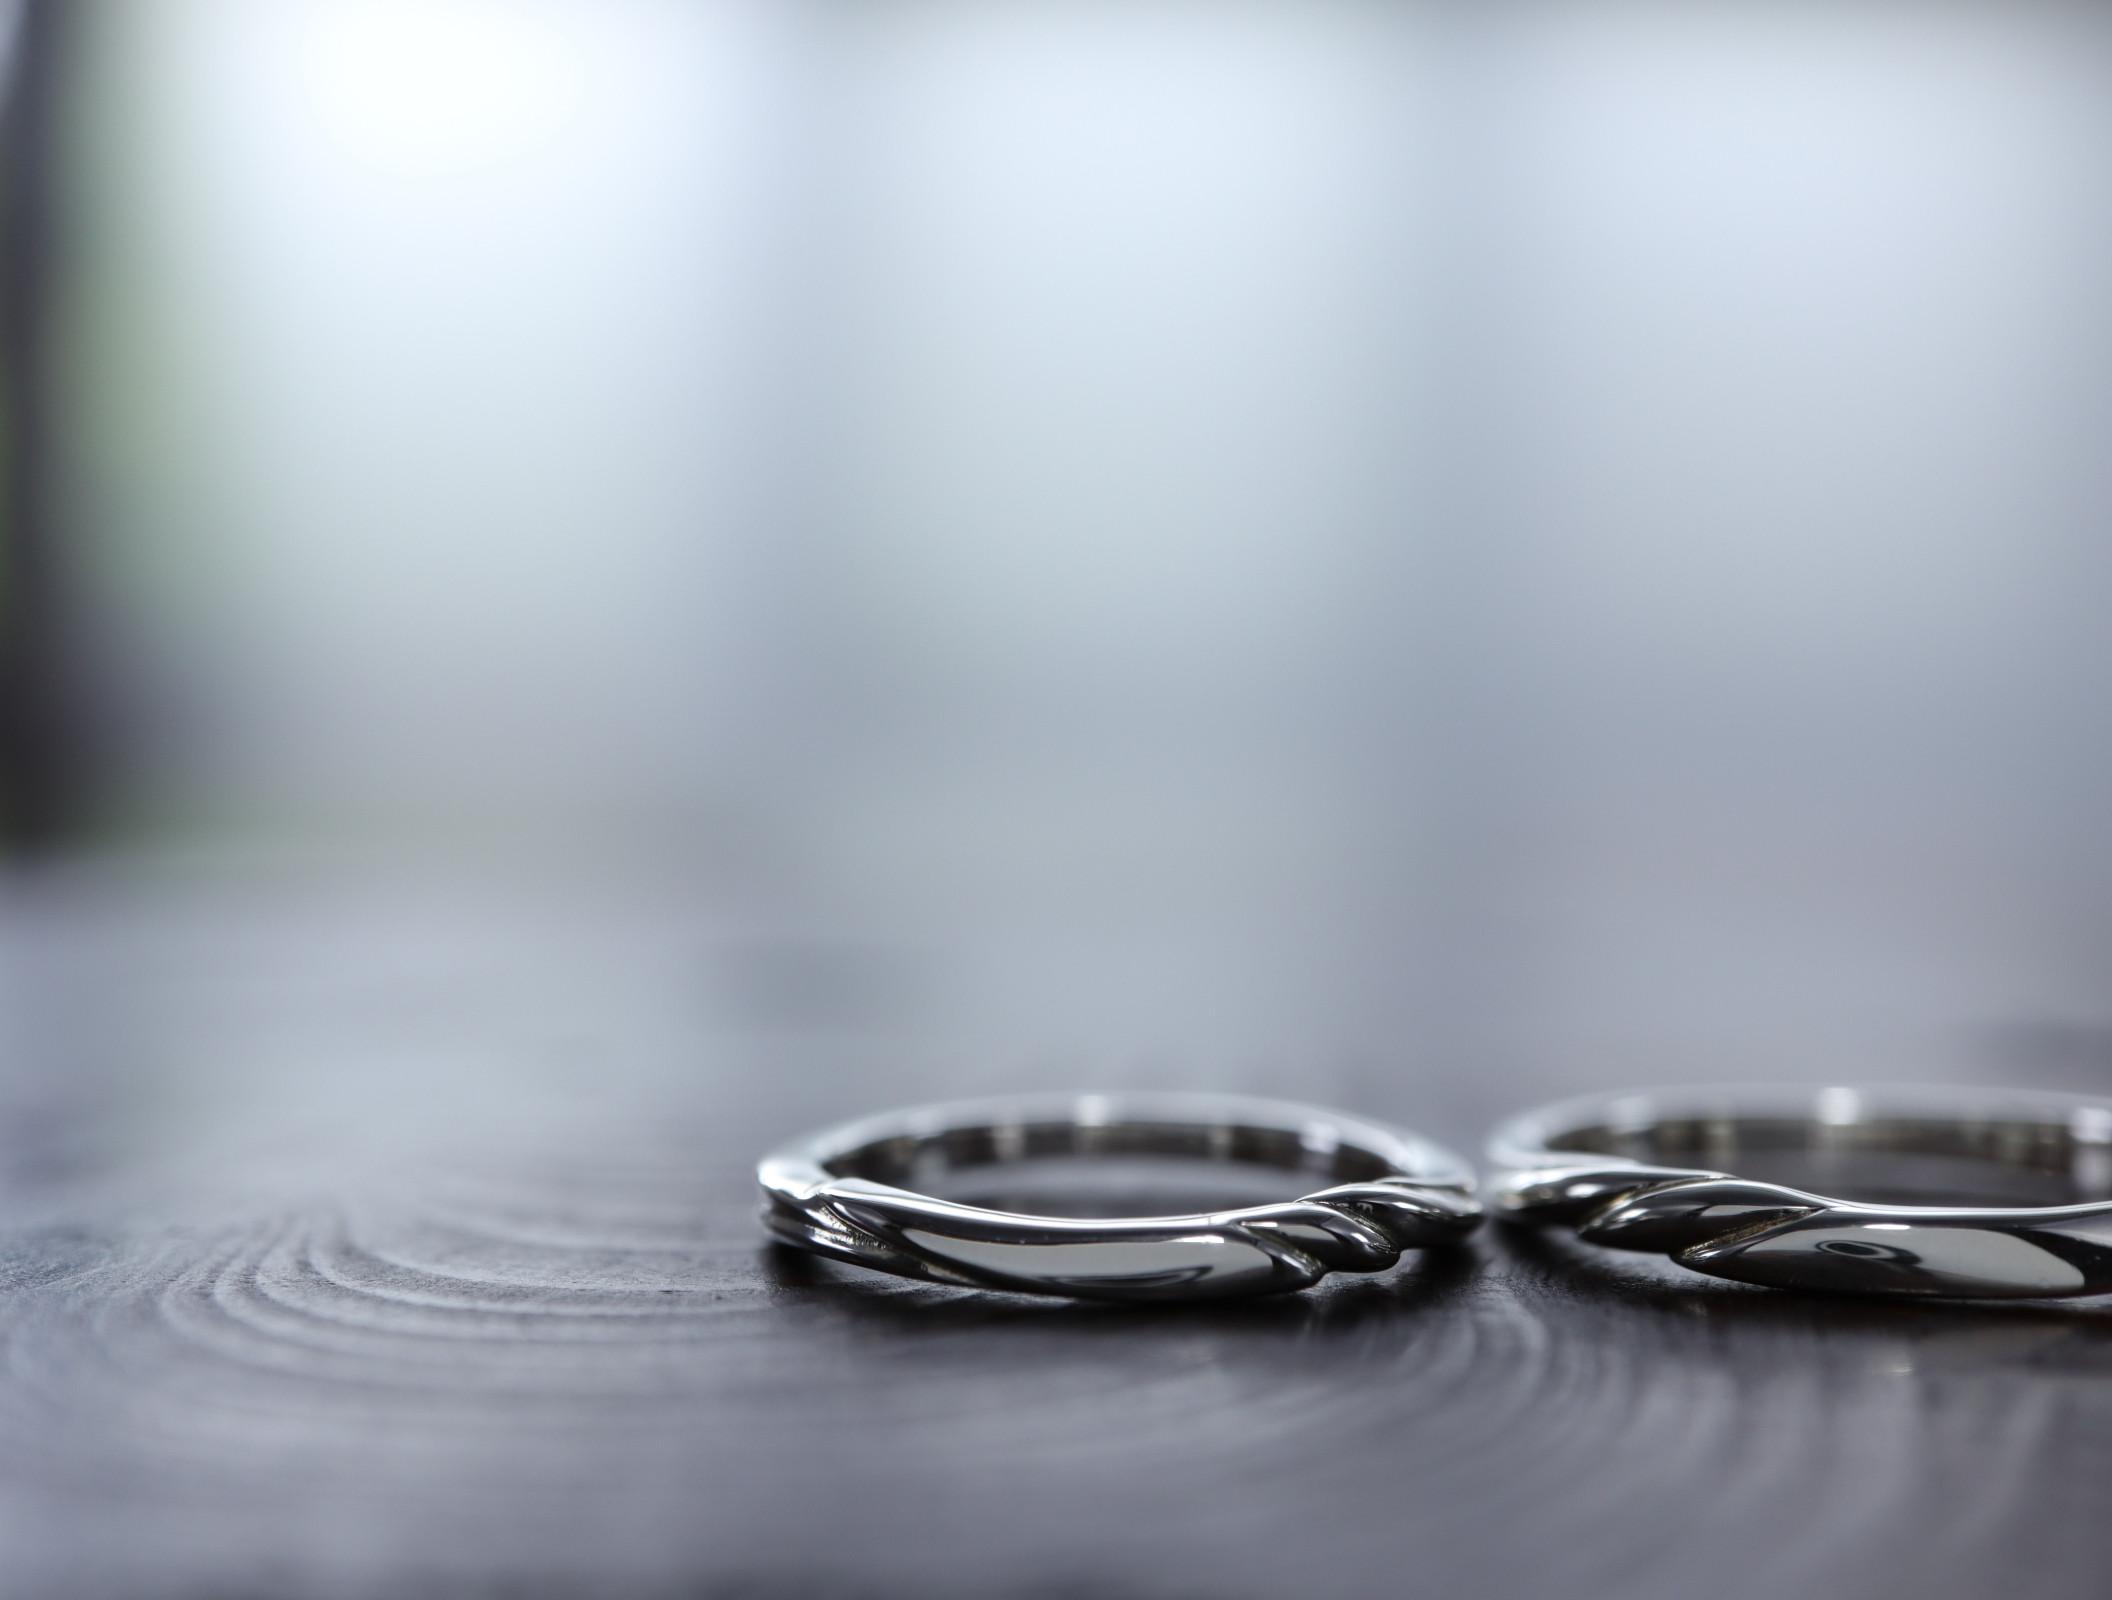 genchou design 手作り結婚指輪プラン